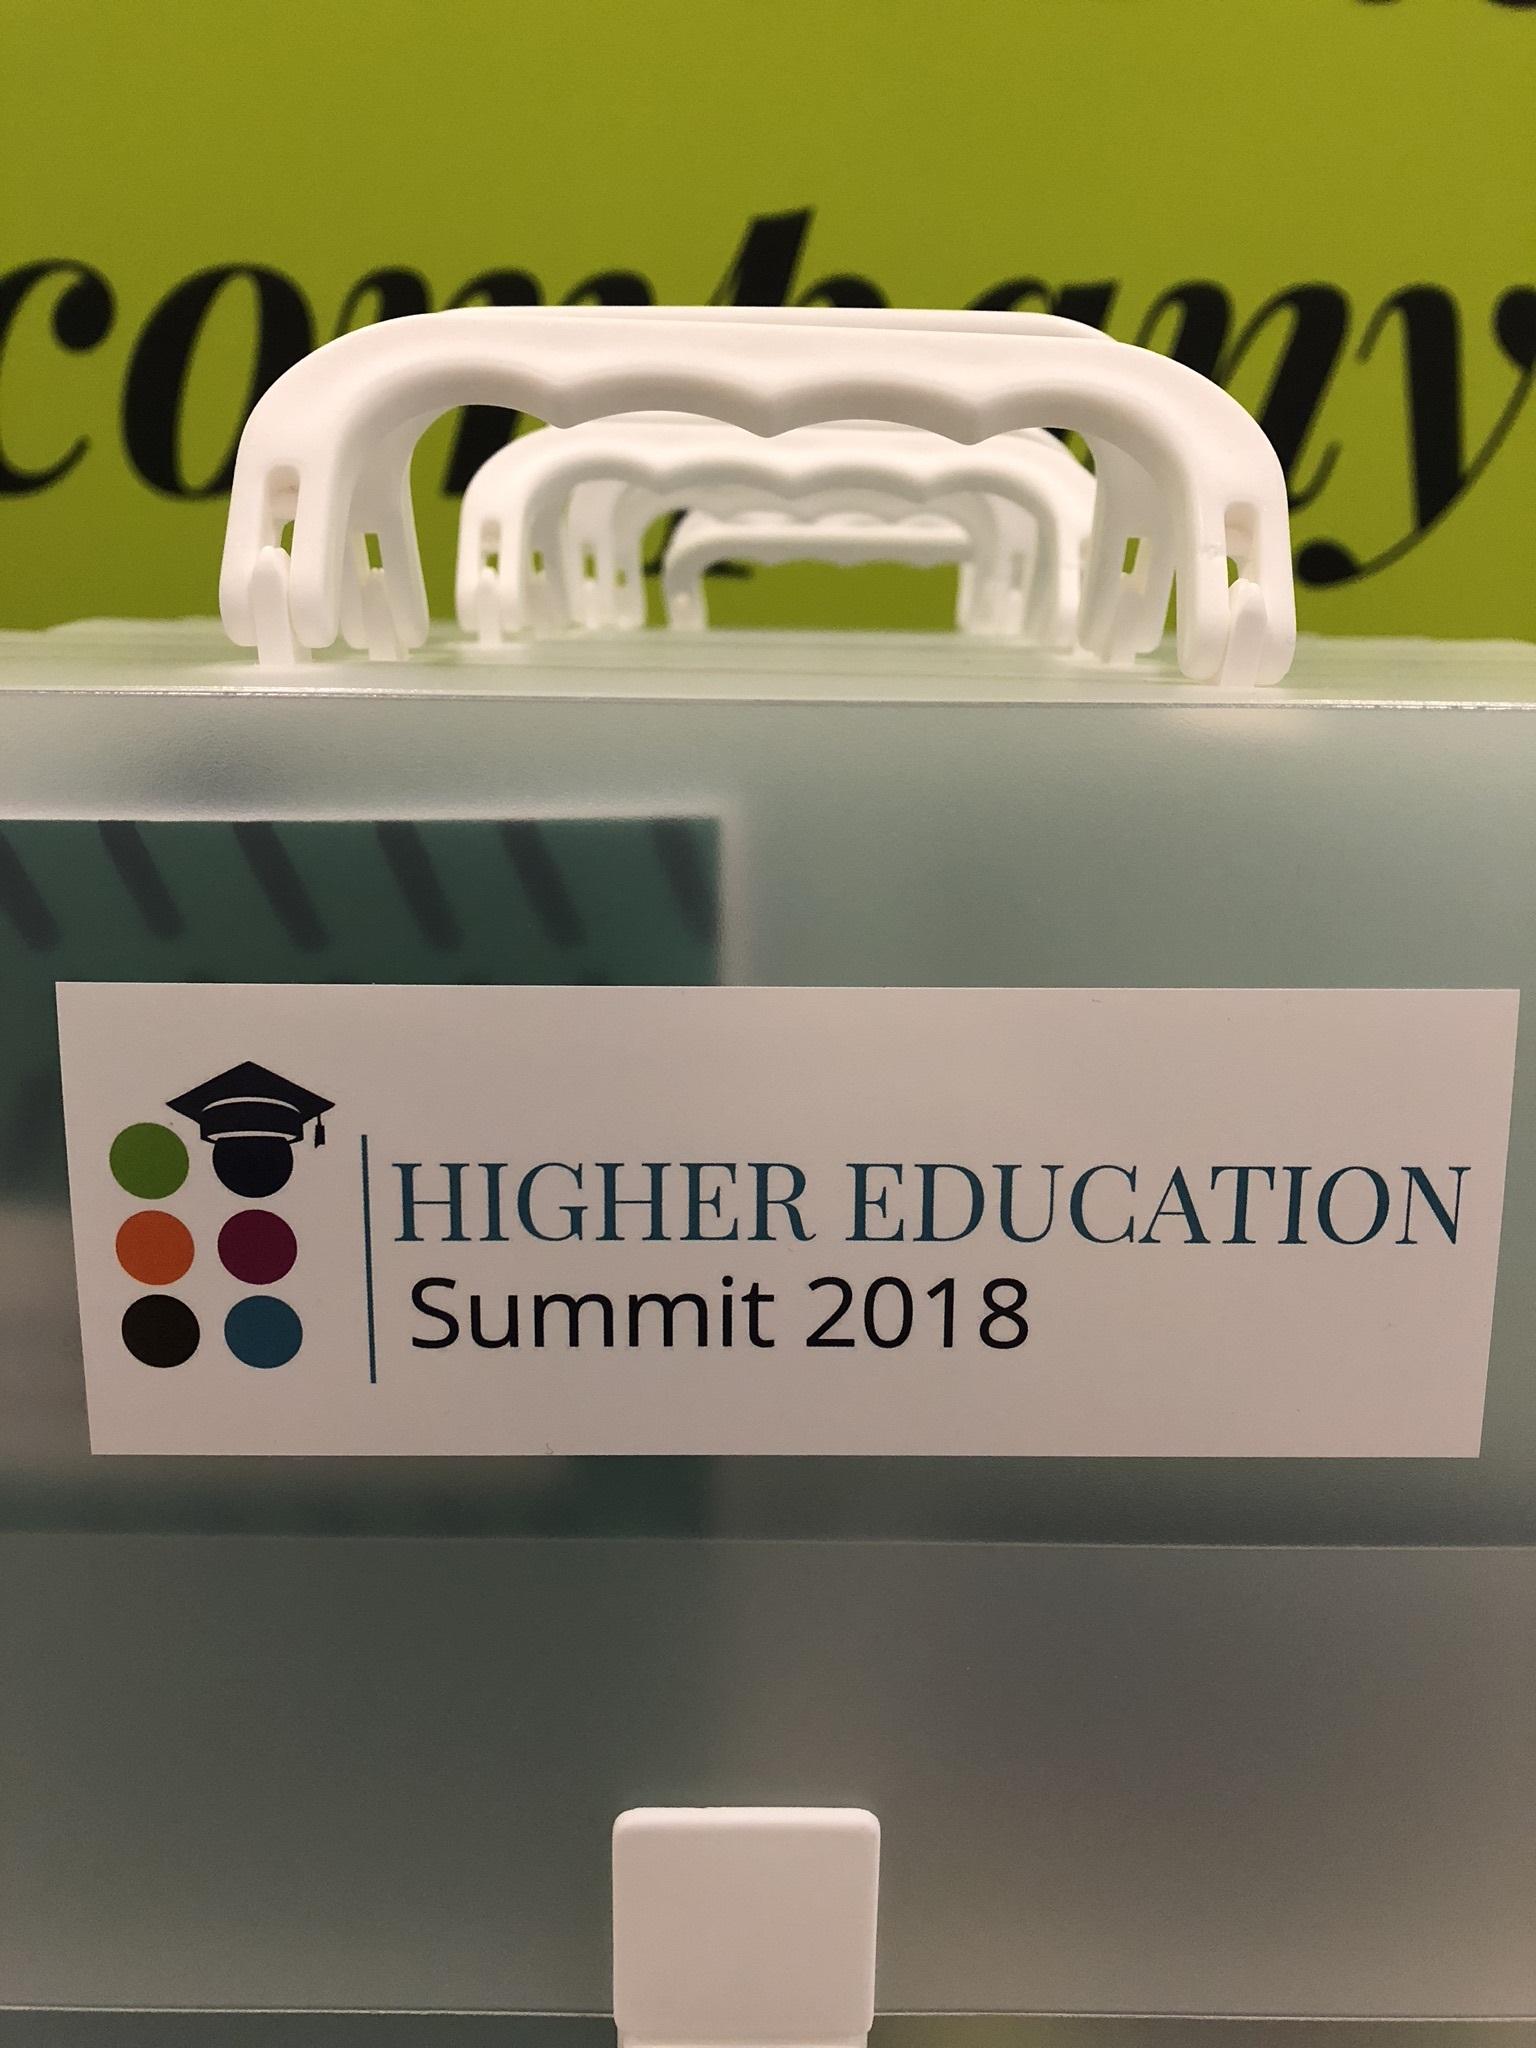 Teilnahme am Higher Education Summit 2018